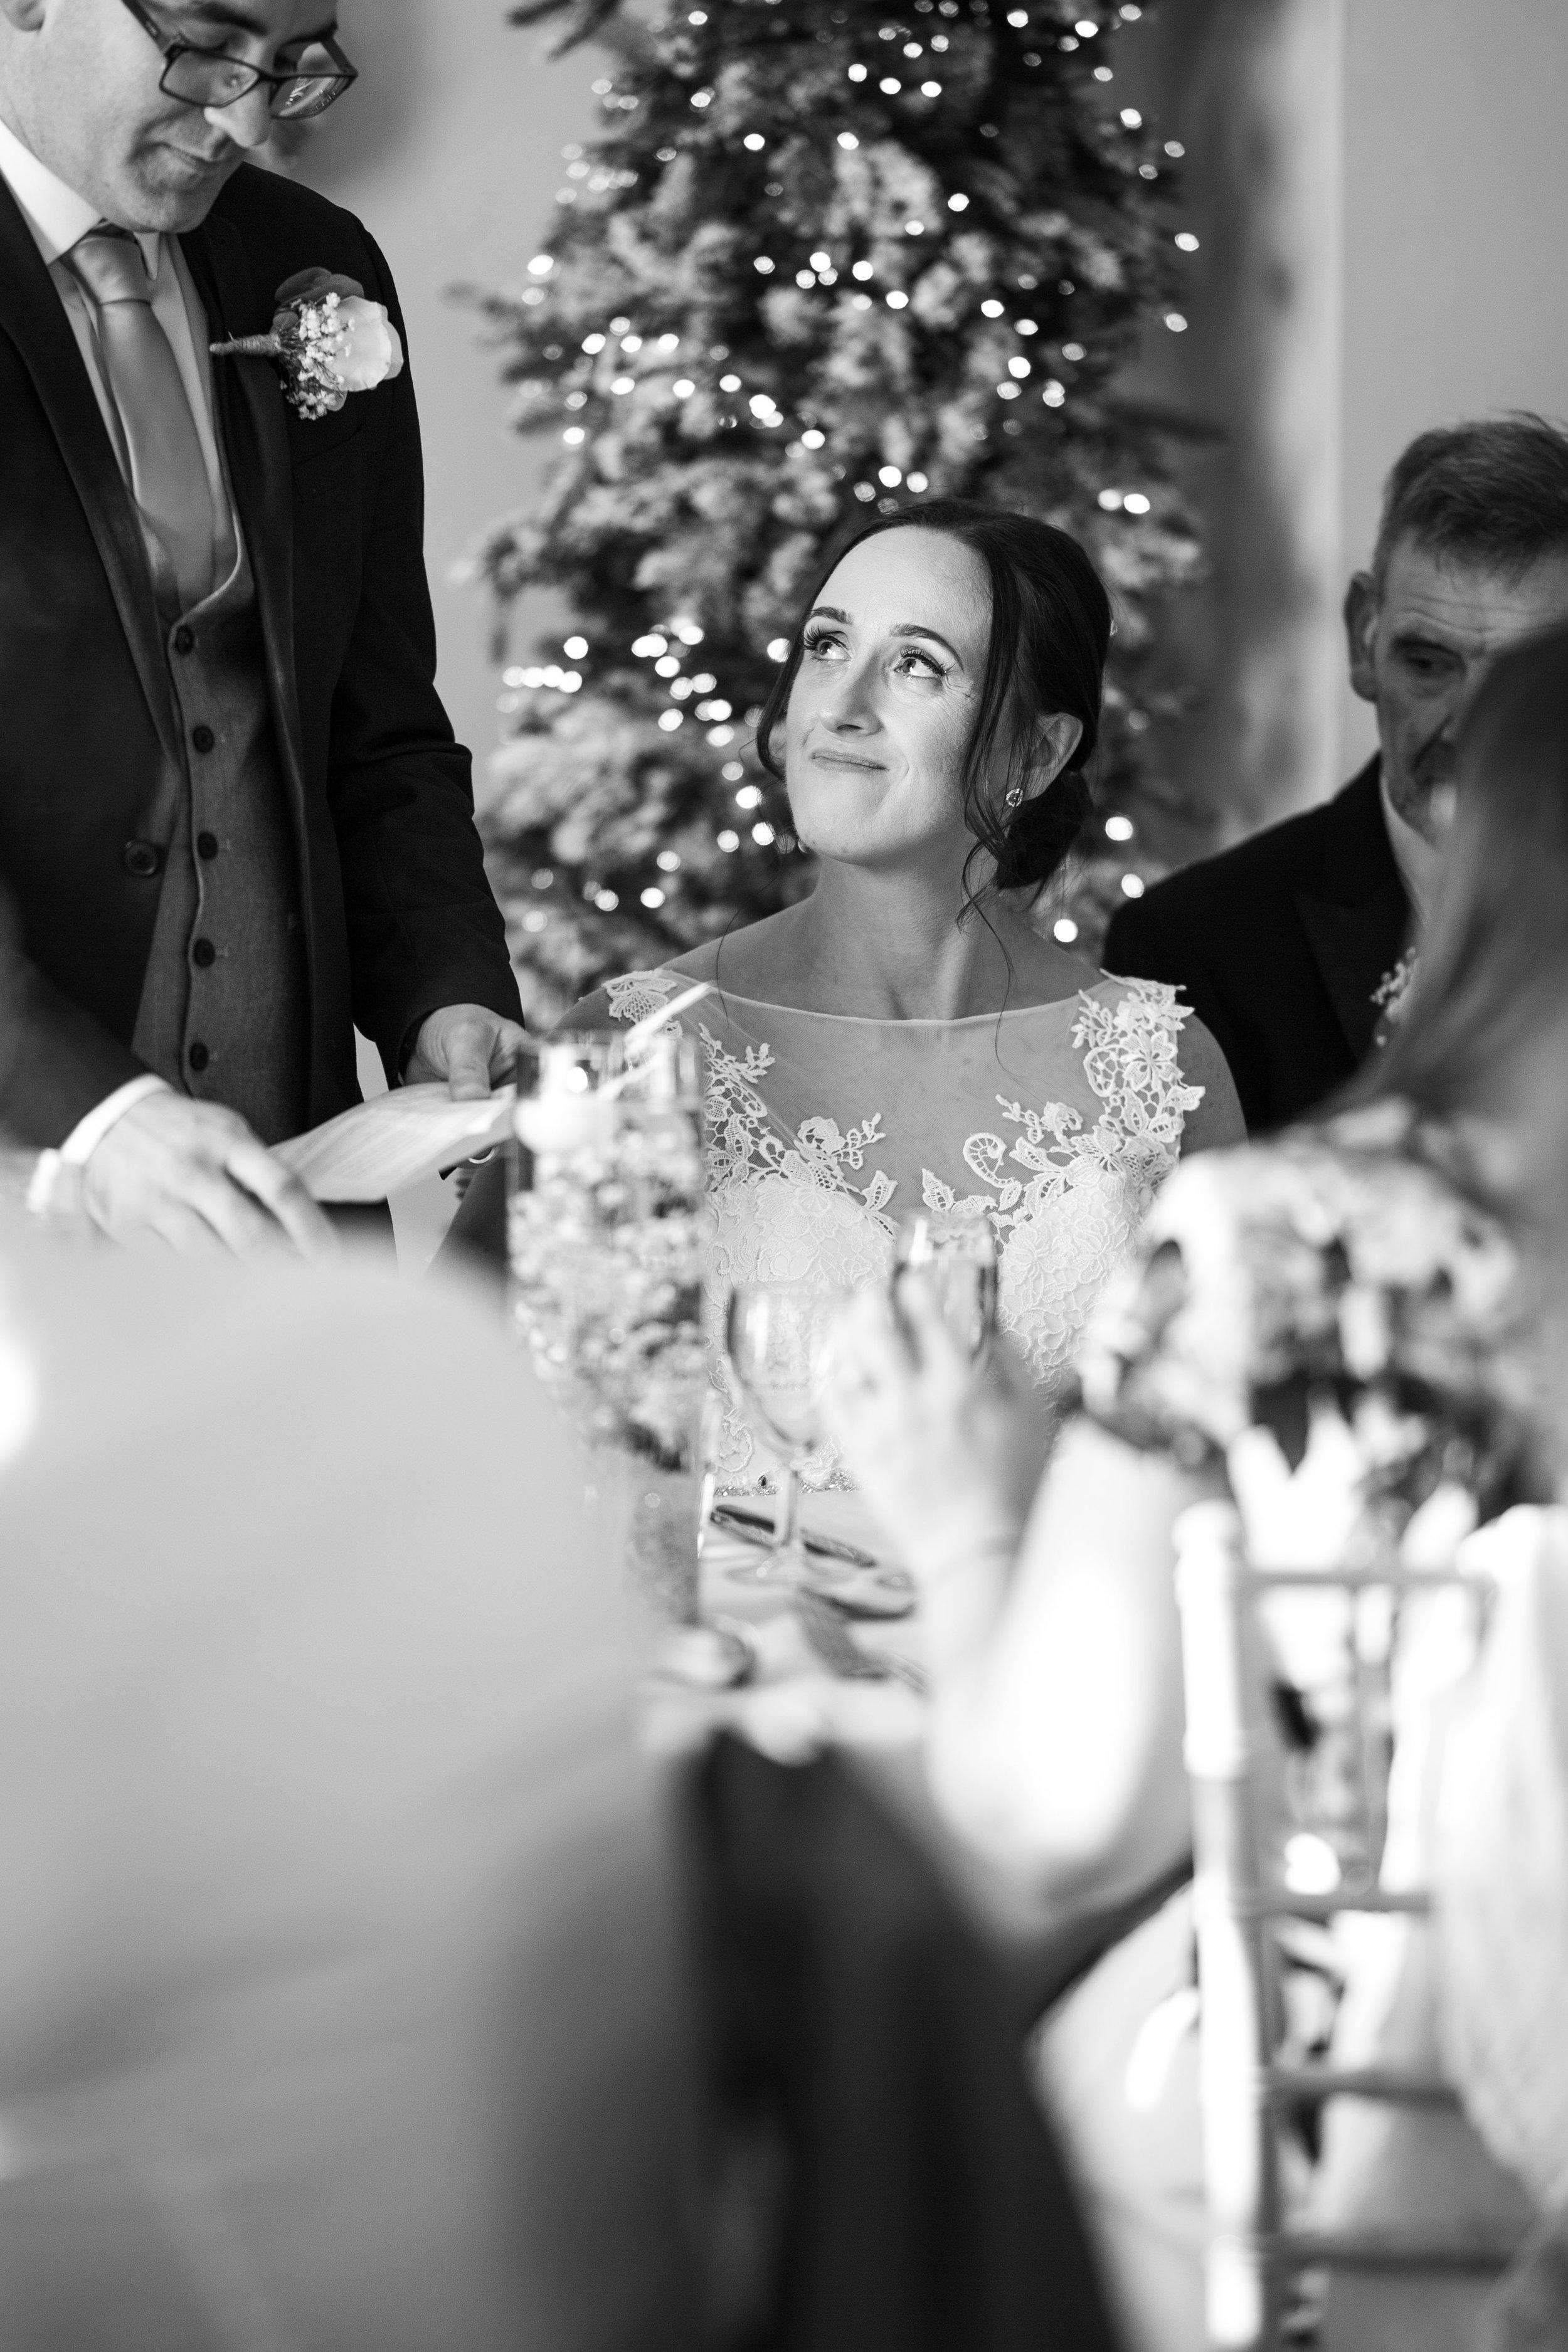 wedding-photos-willenhall-wedding-photographer-wolverhampton-wedding-photographer-west-midlands-wedding-photographer-birmingham-speech